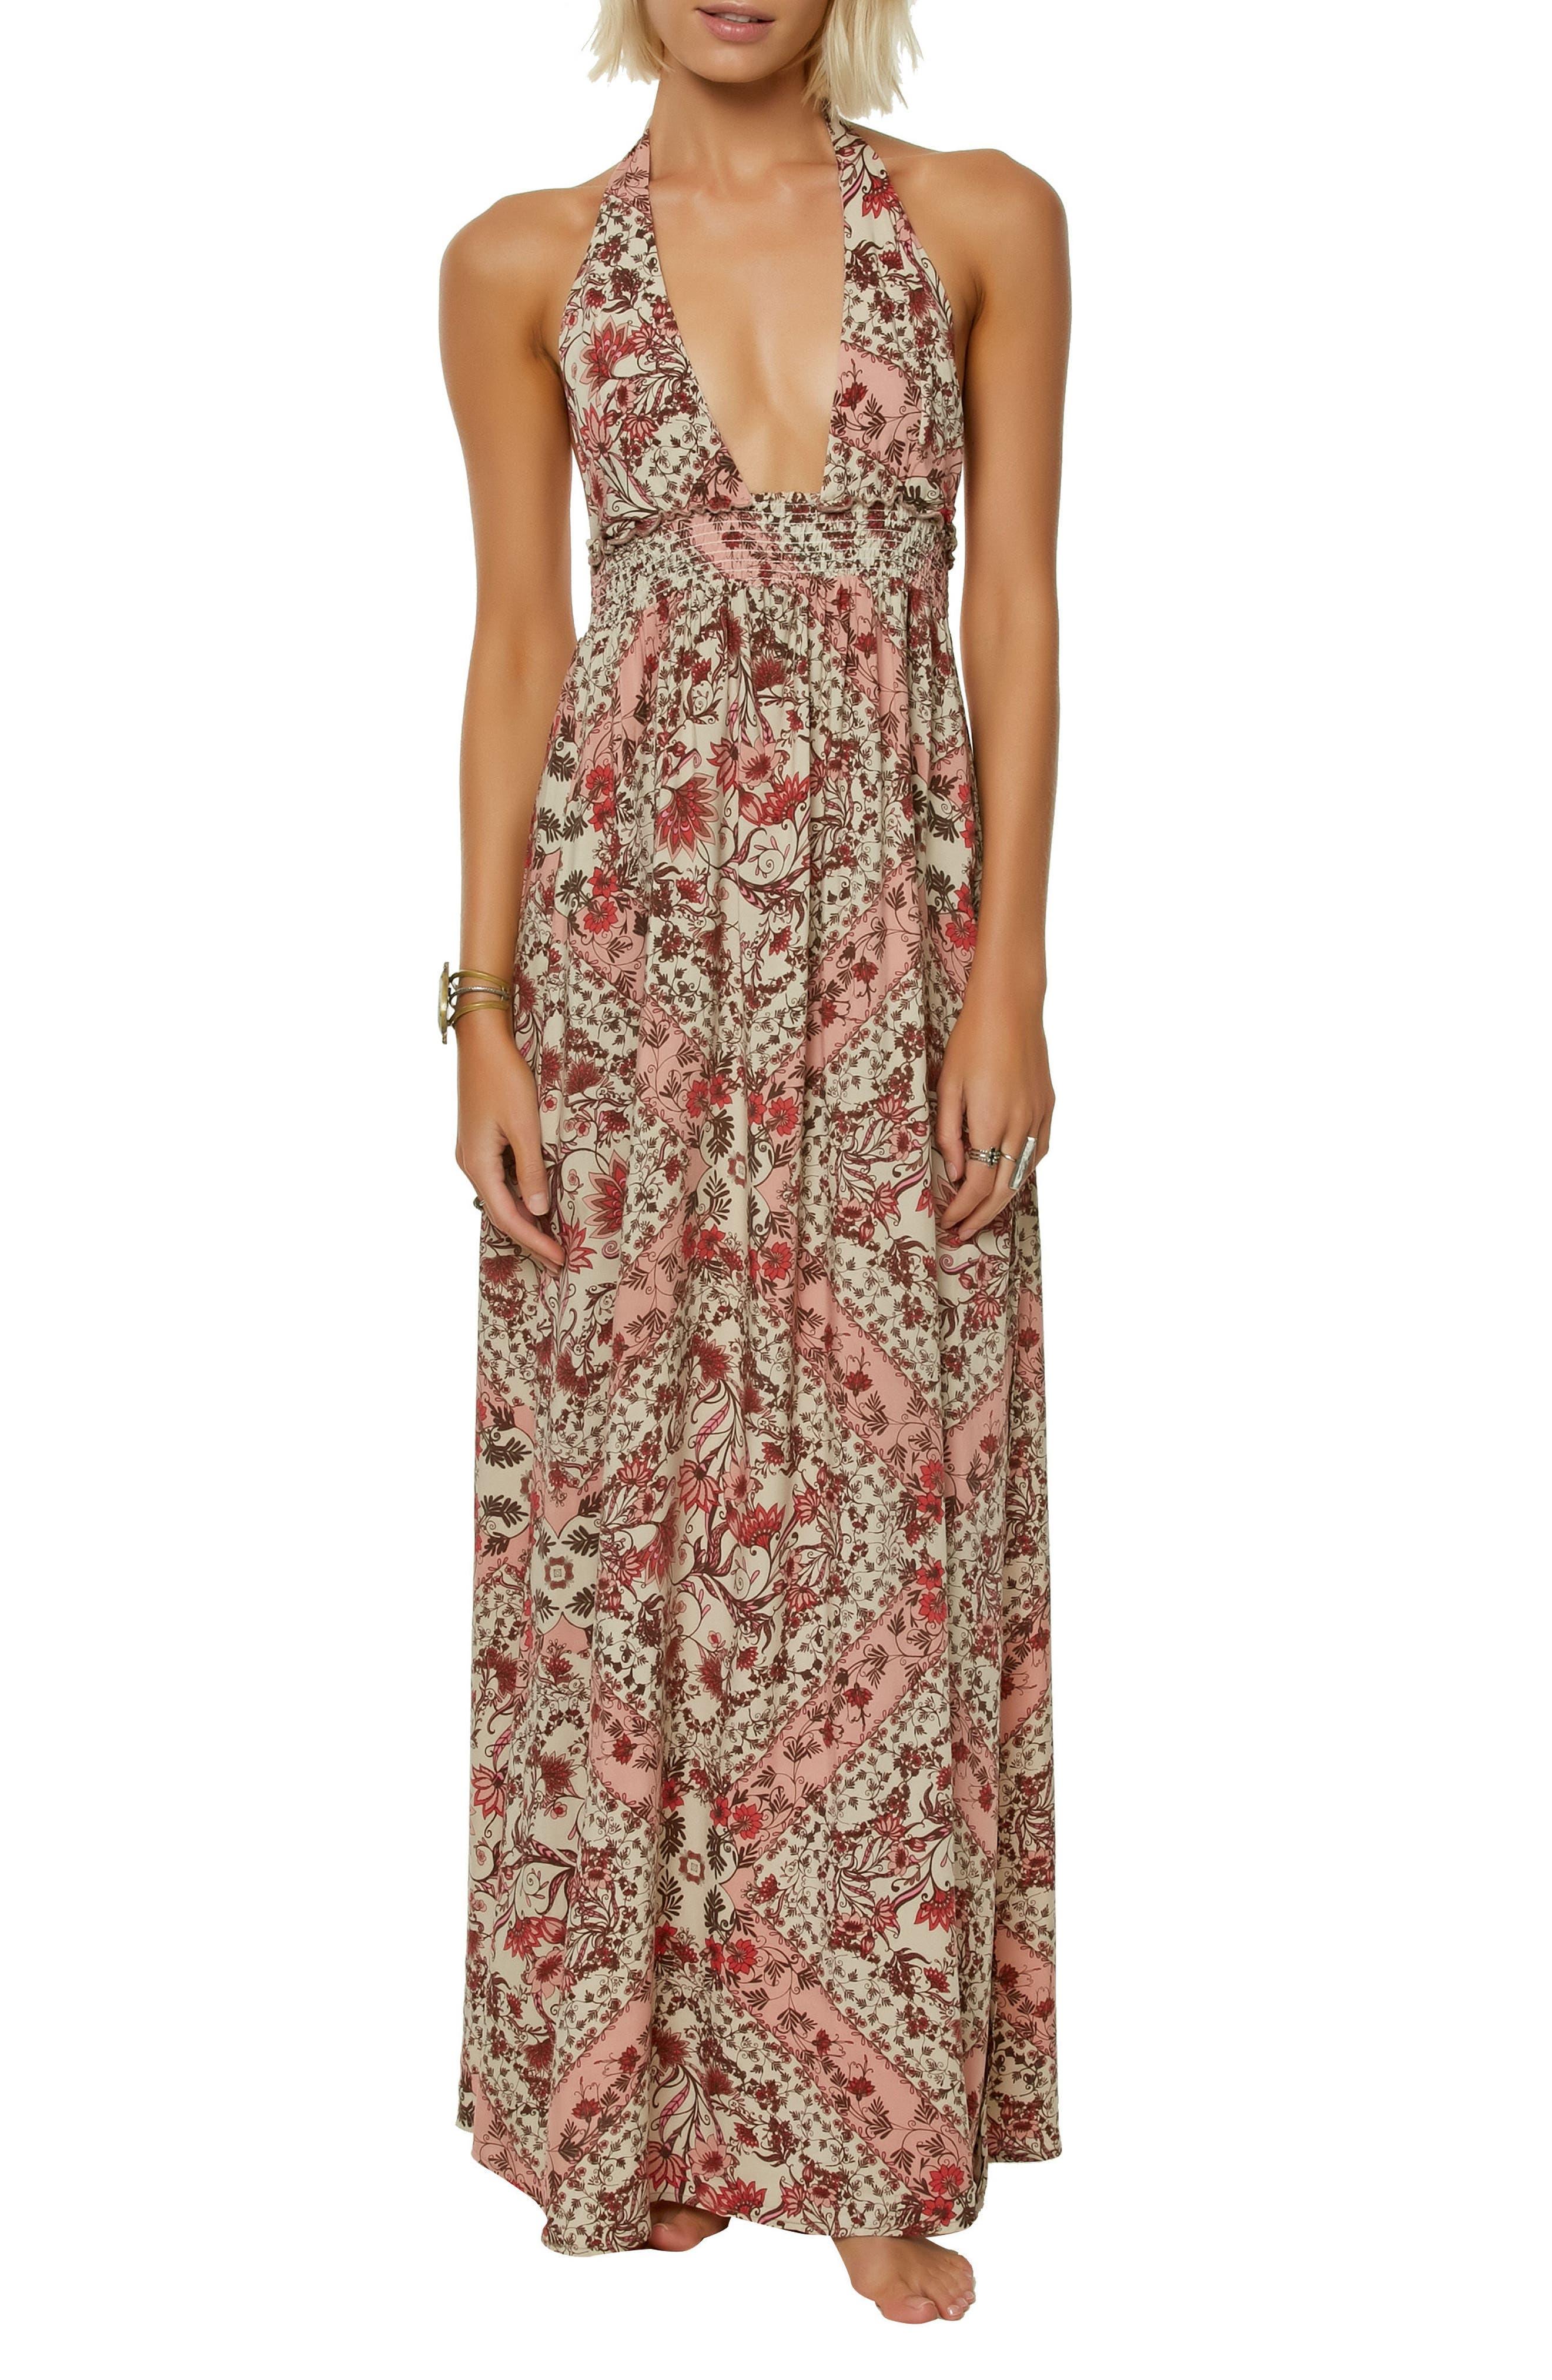 Dolley Halter Neck Maxi Dress,                         Main,                         color, 694